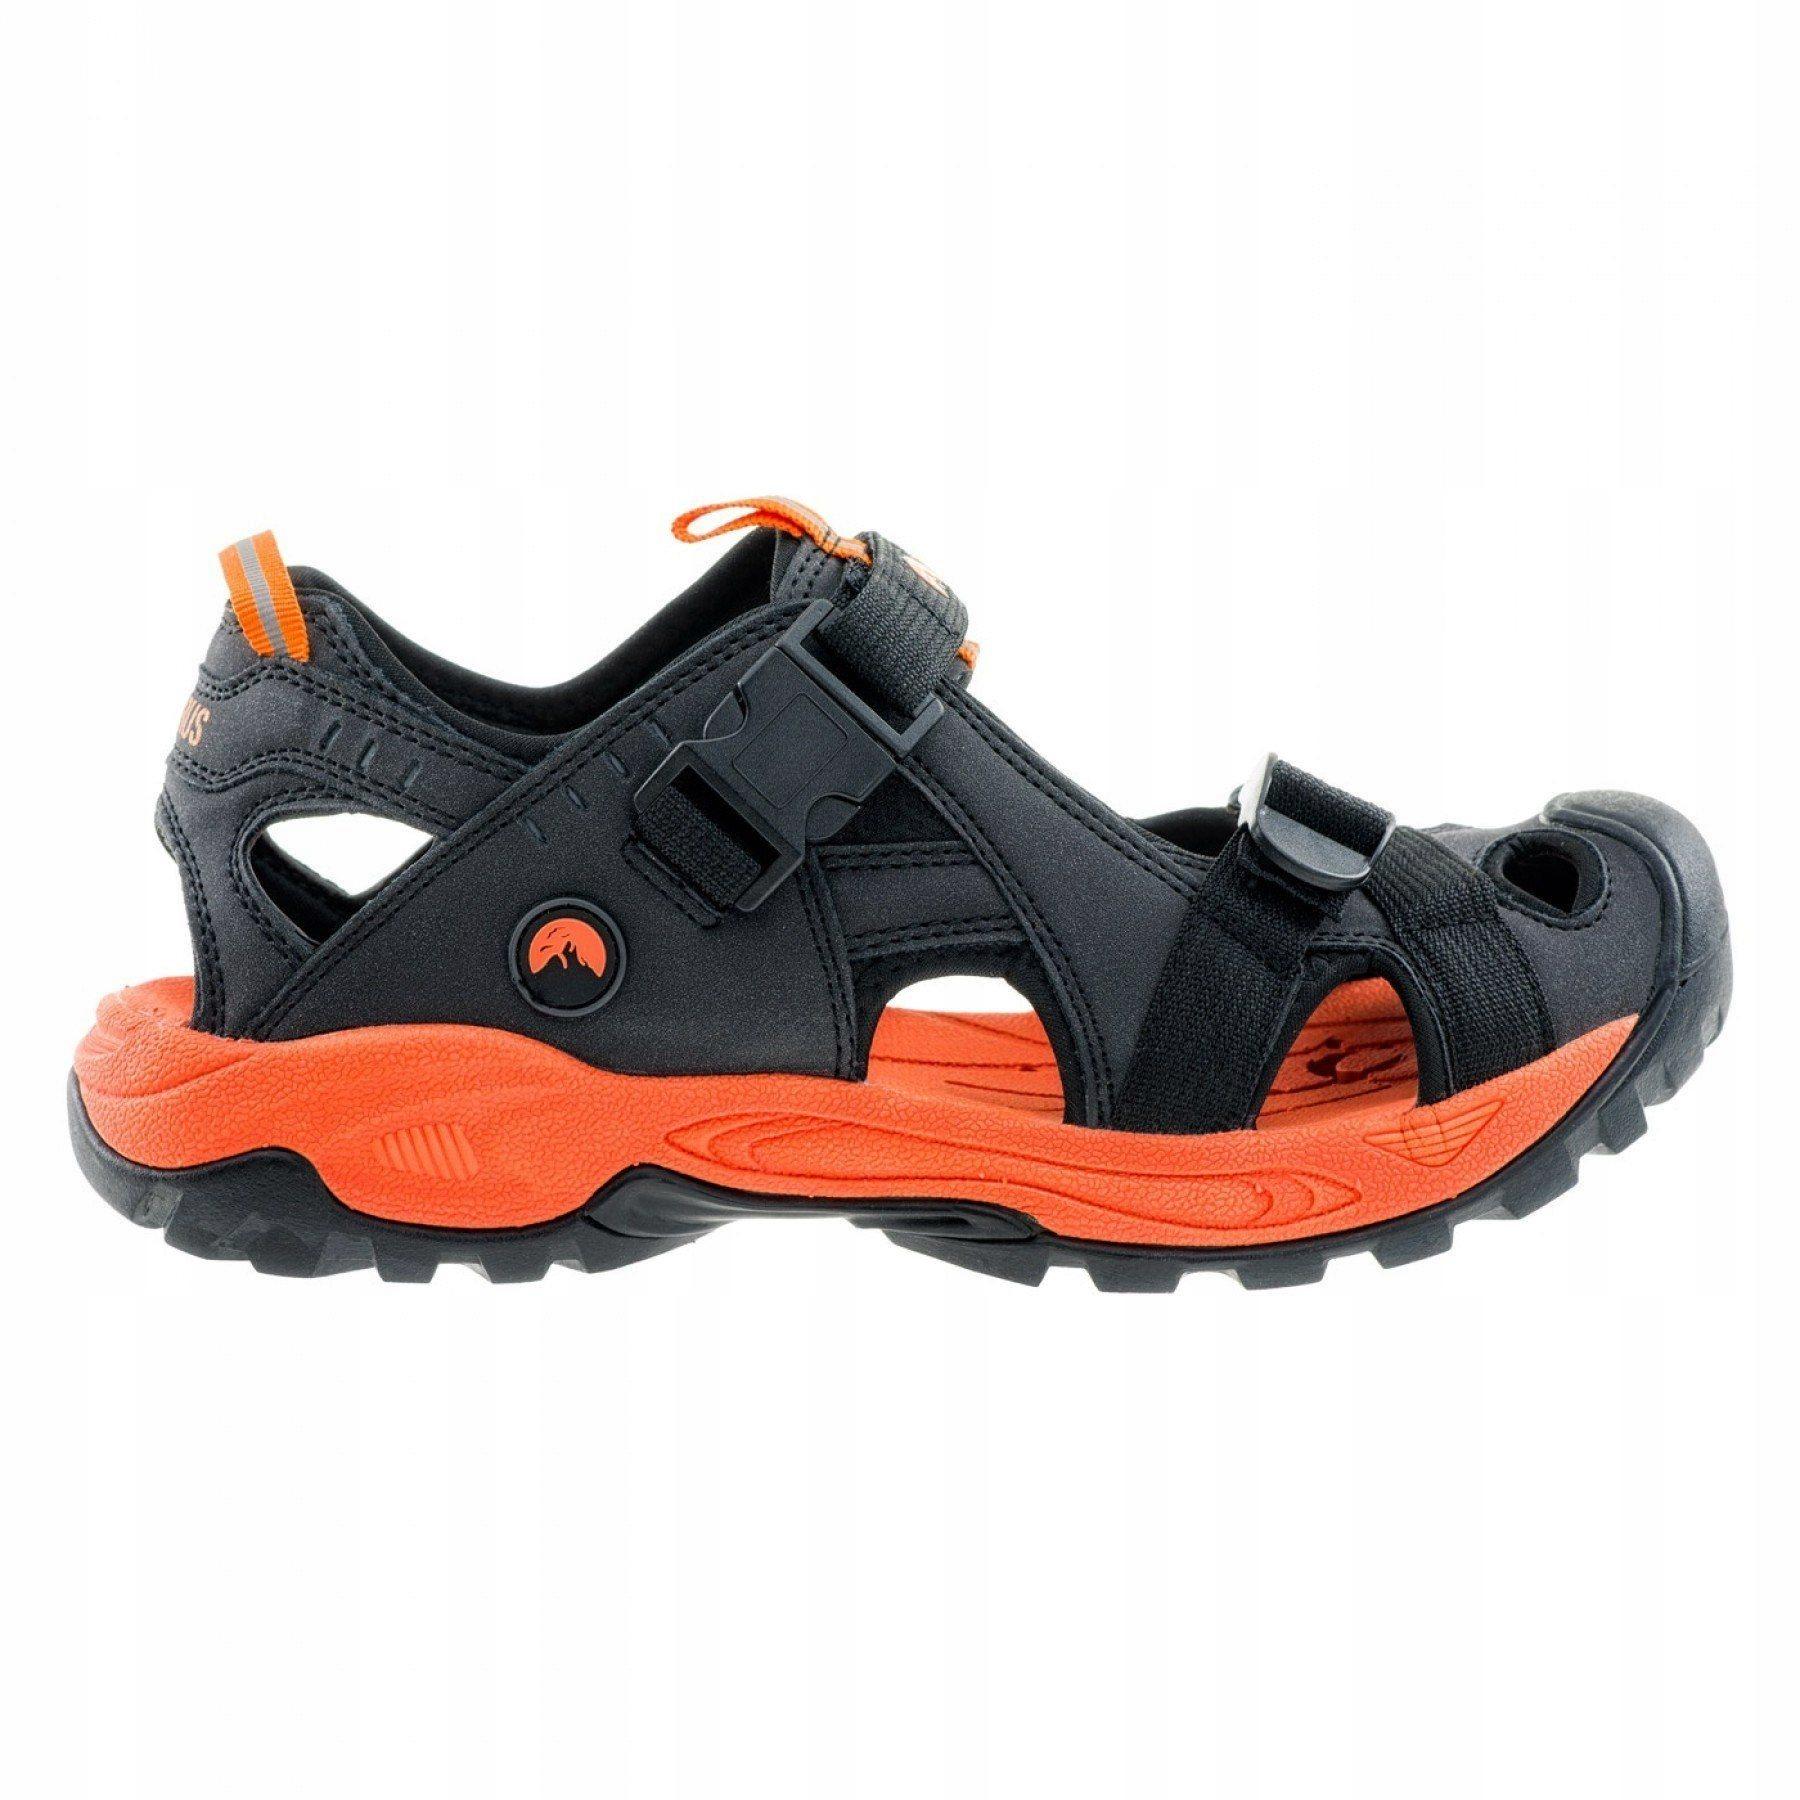 Elbrus Sandały męskie Gatsen Black/ Orange r. 44